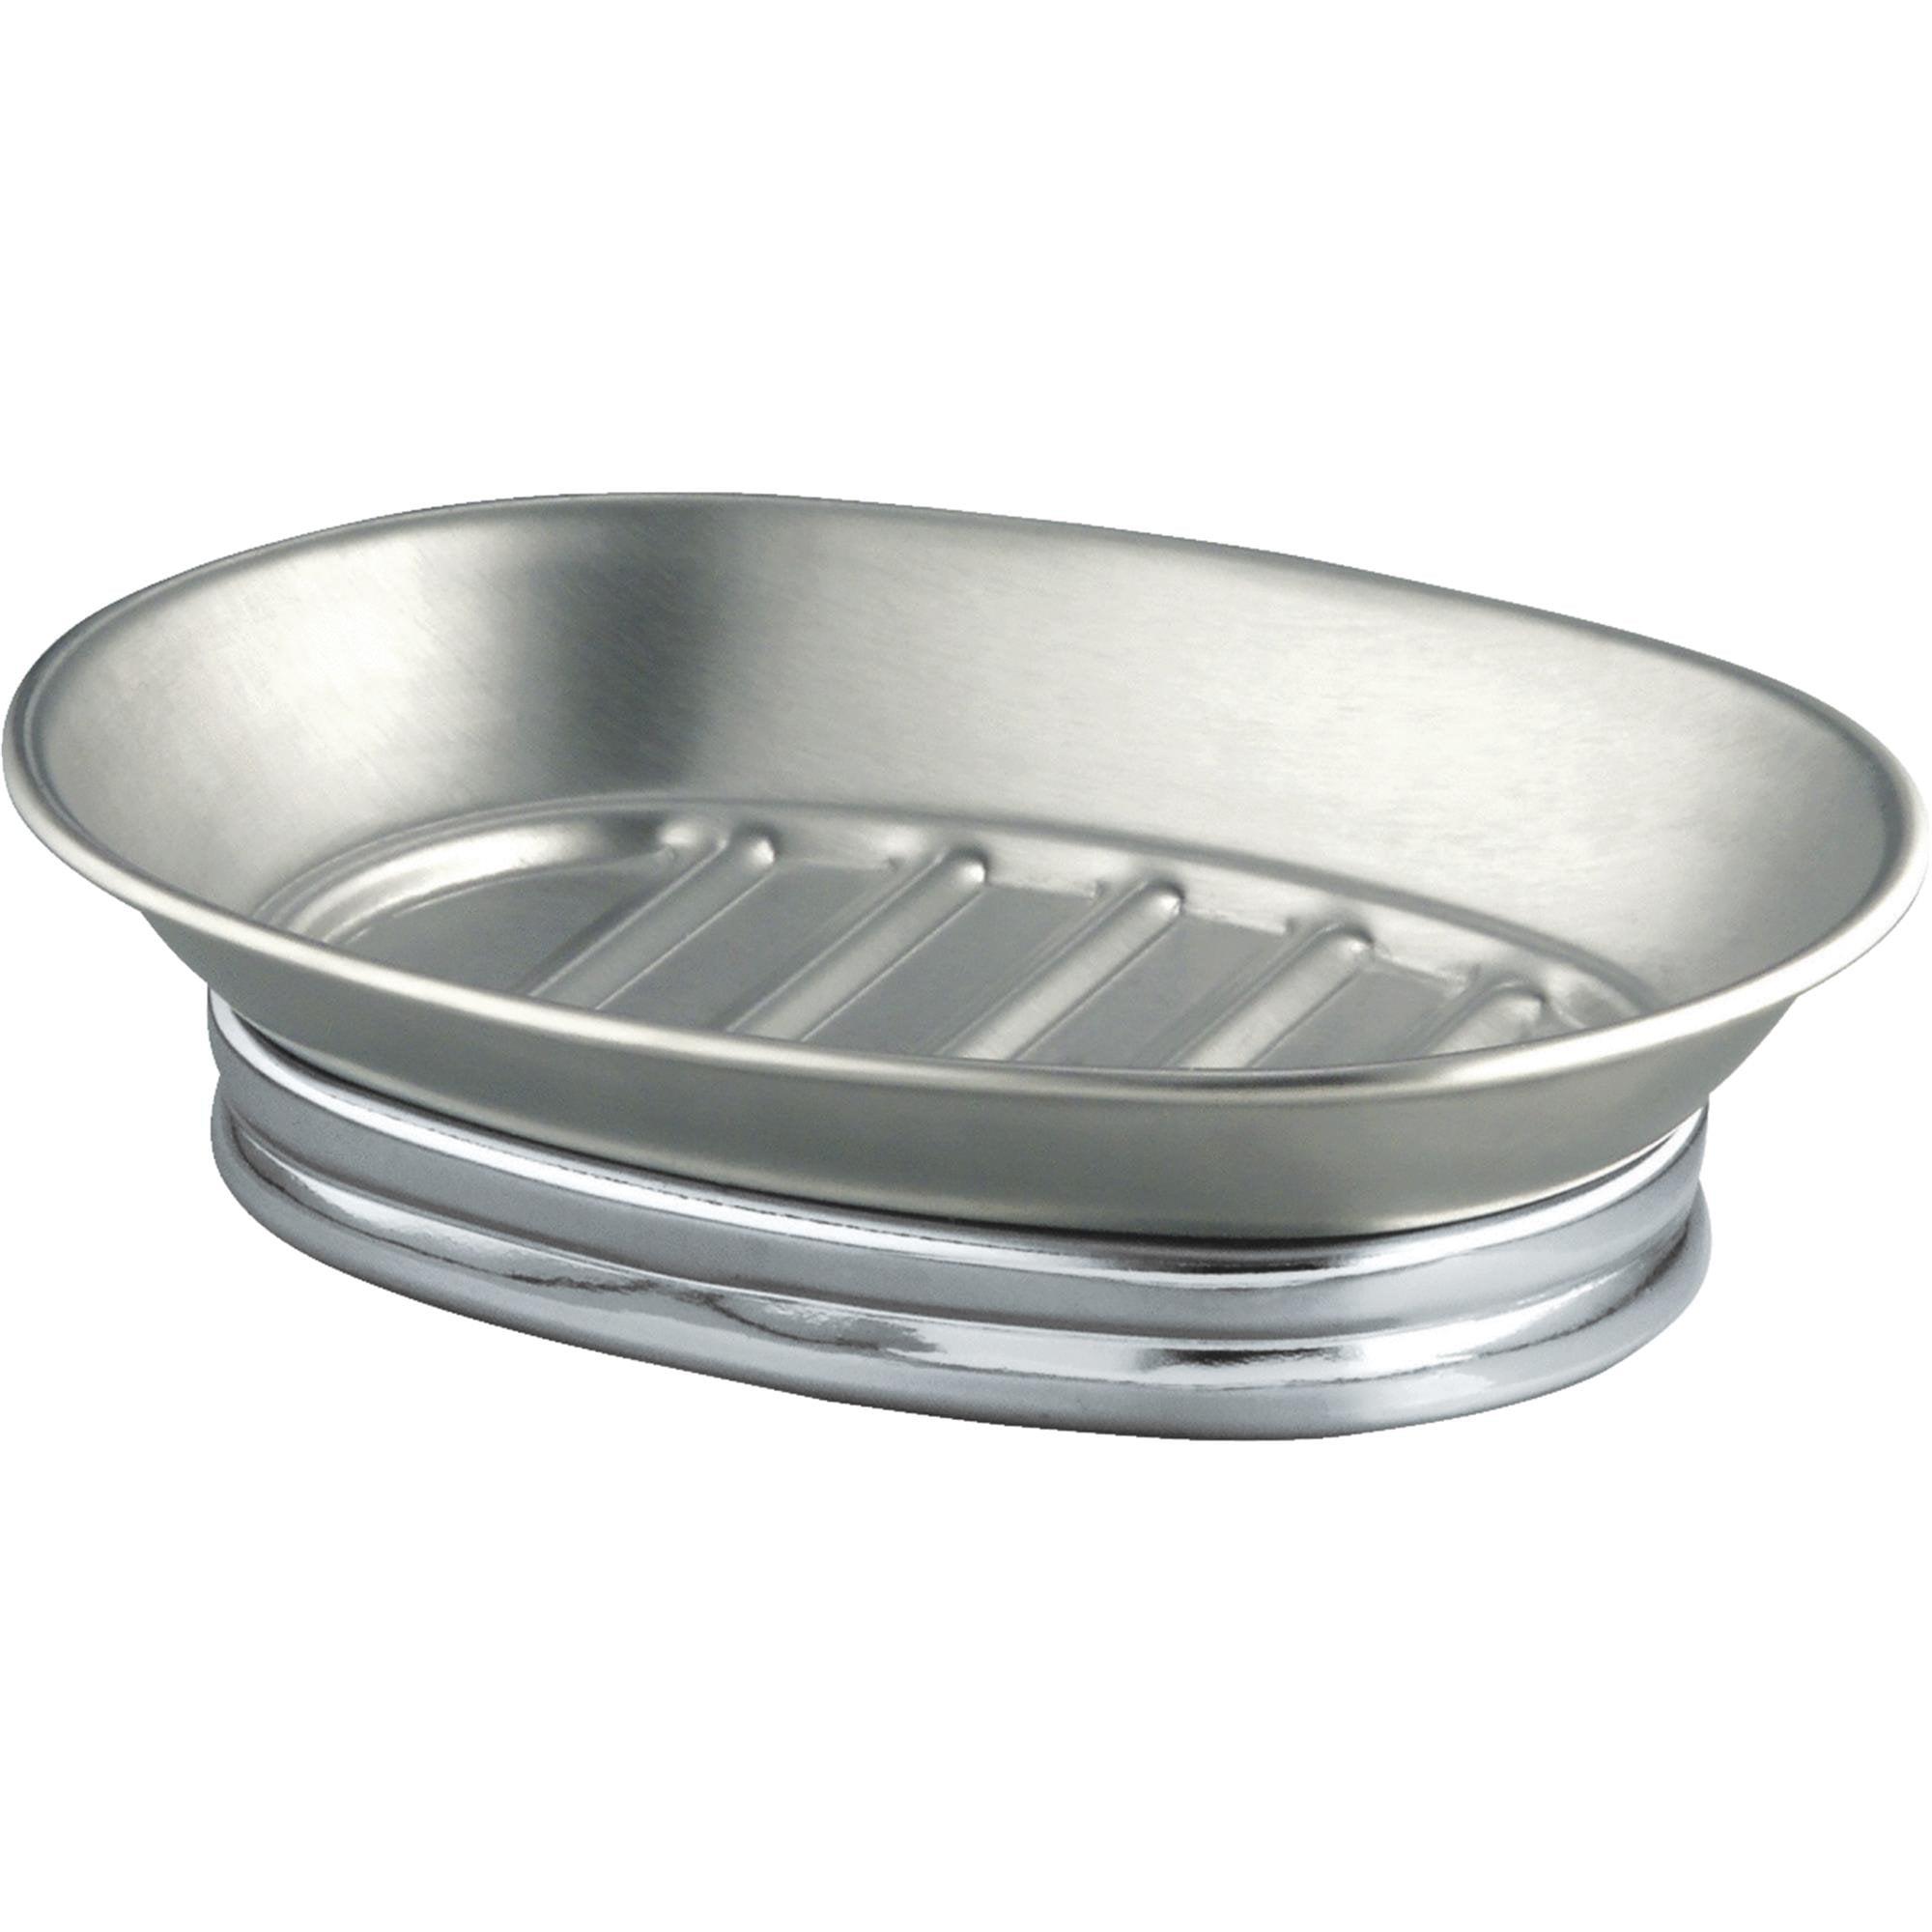 York Soap Dish